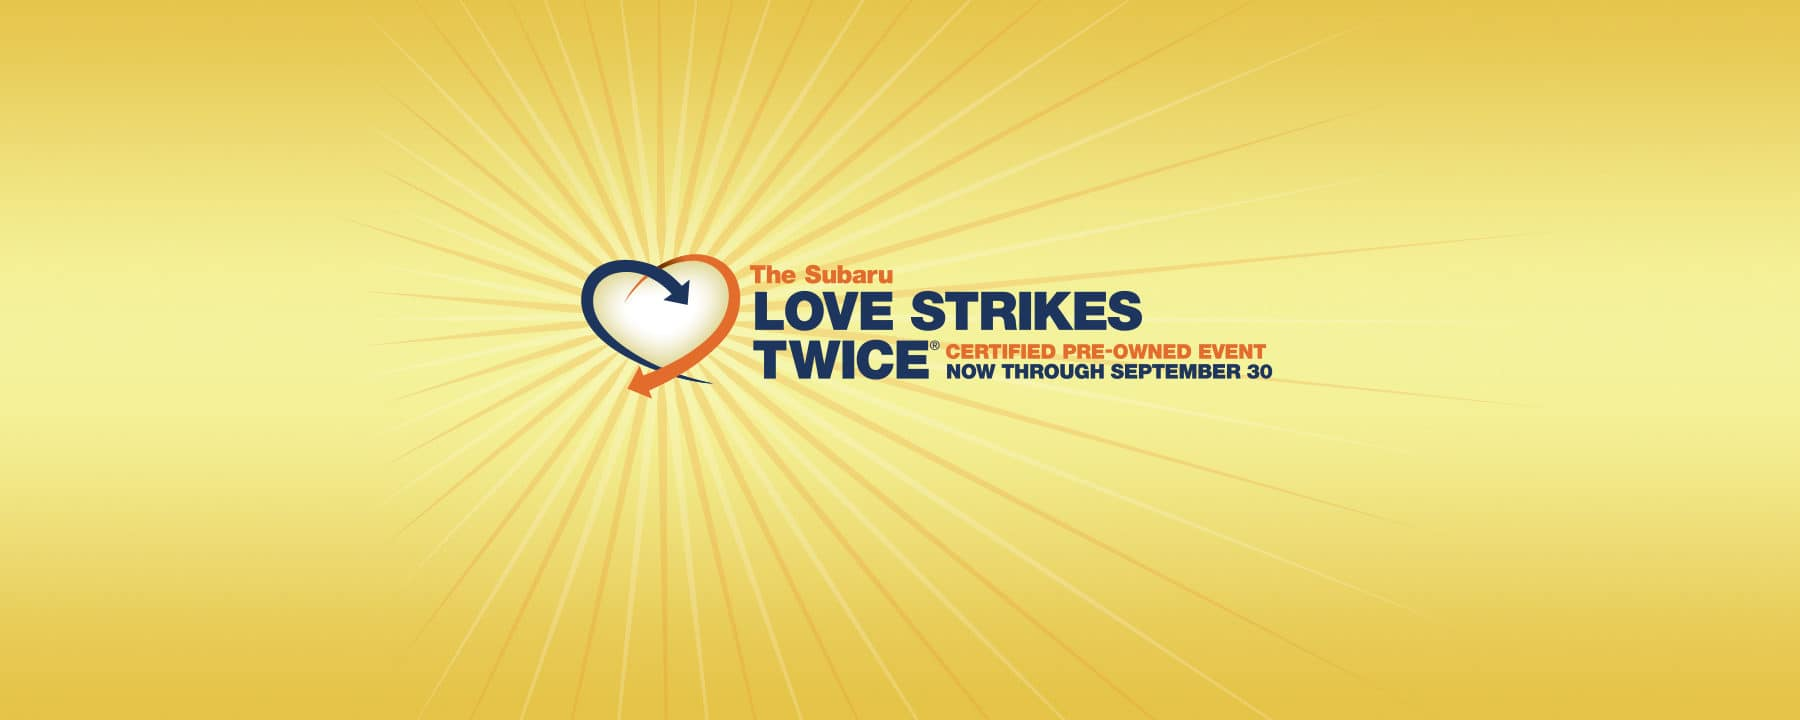 m09-20-love-twice-hpb